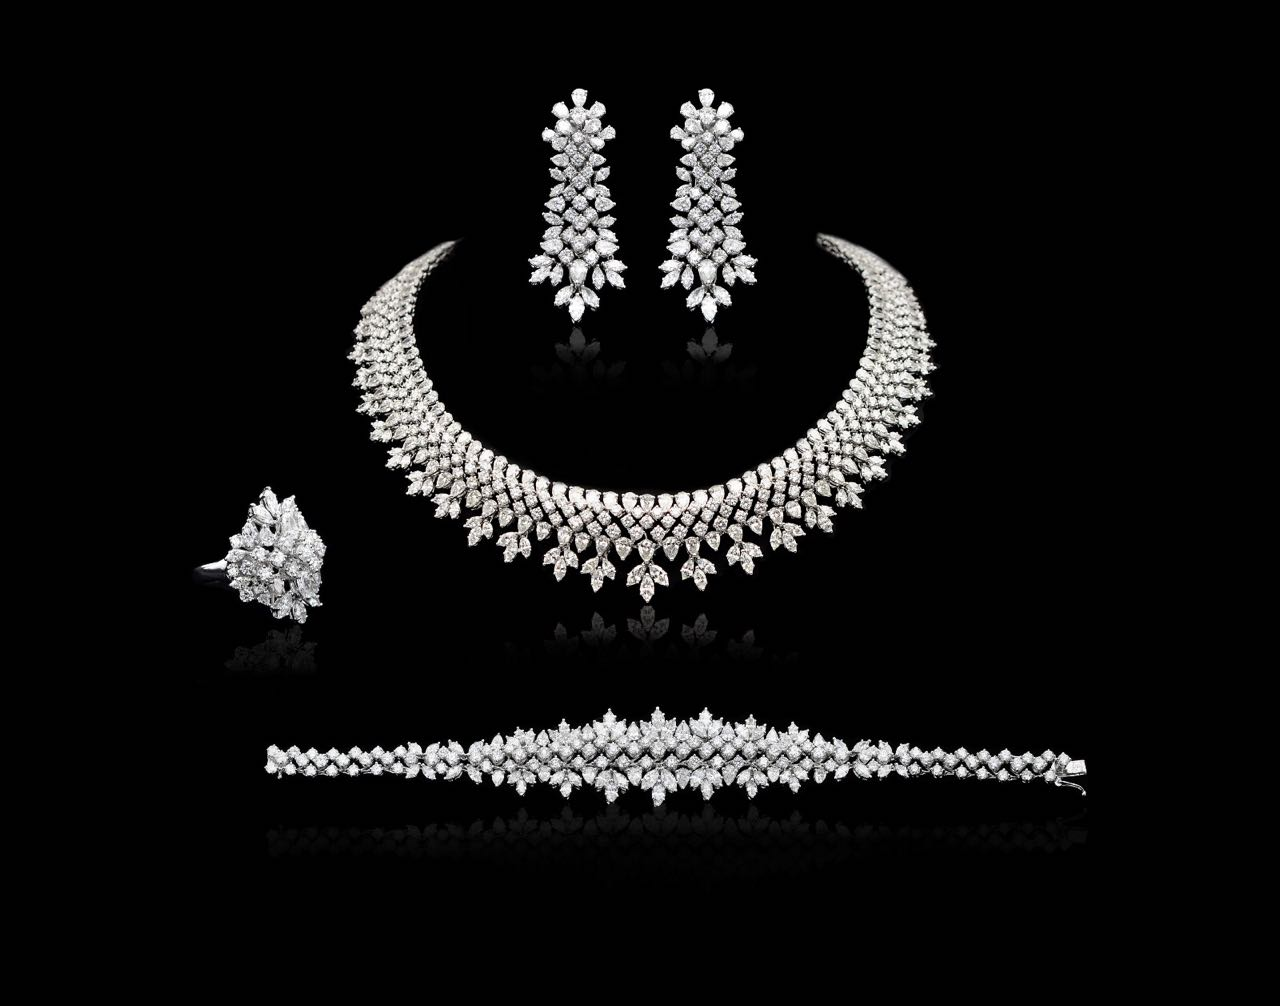 Diamond necklace, earrings, bracelet and ring set